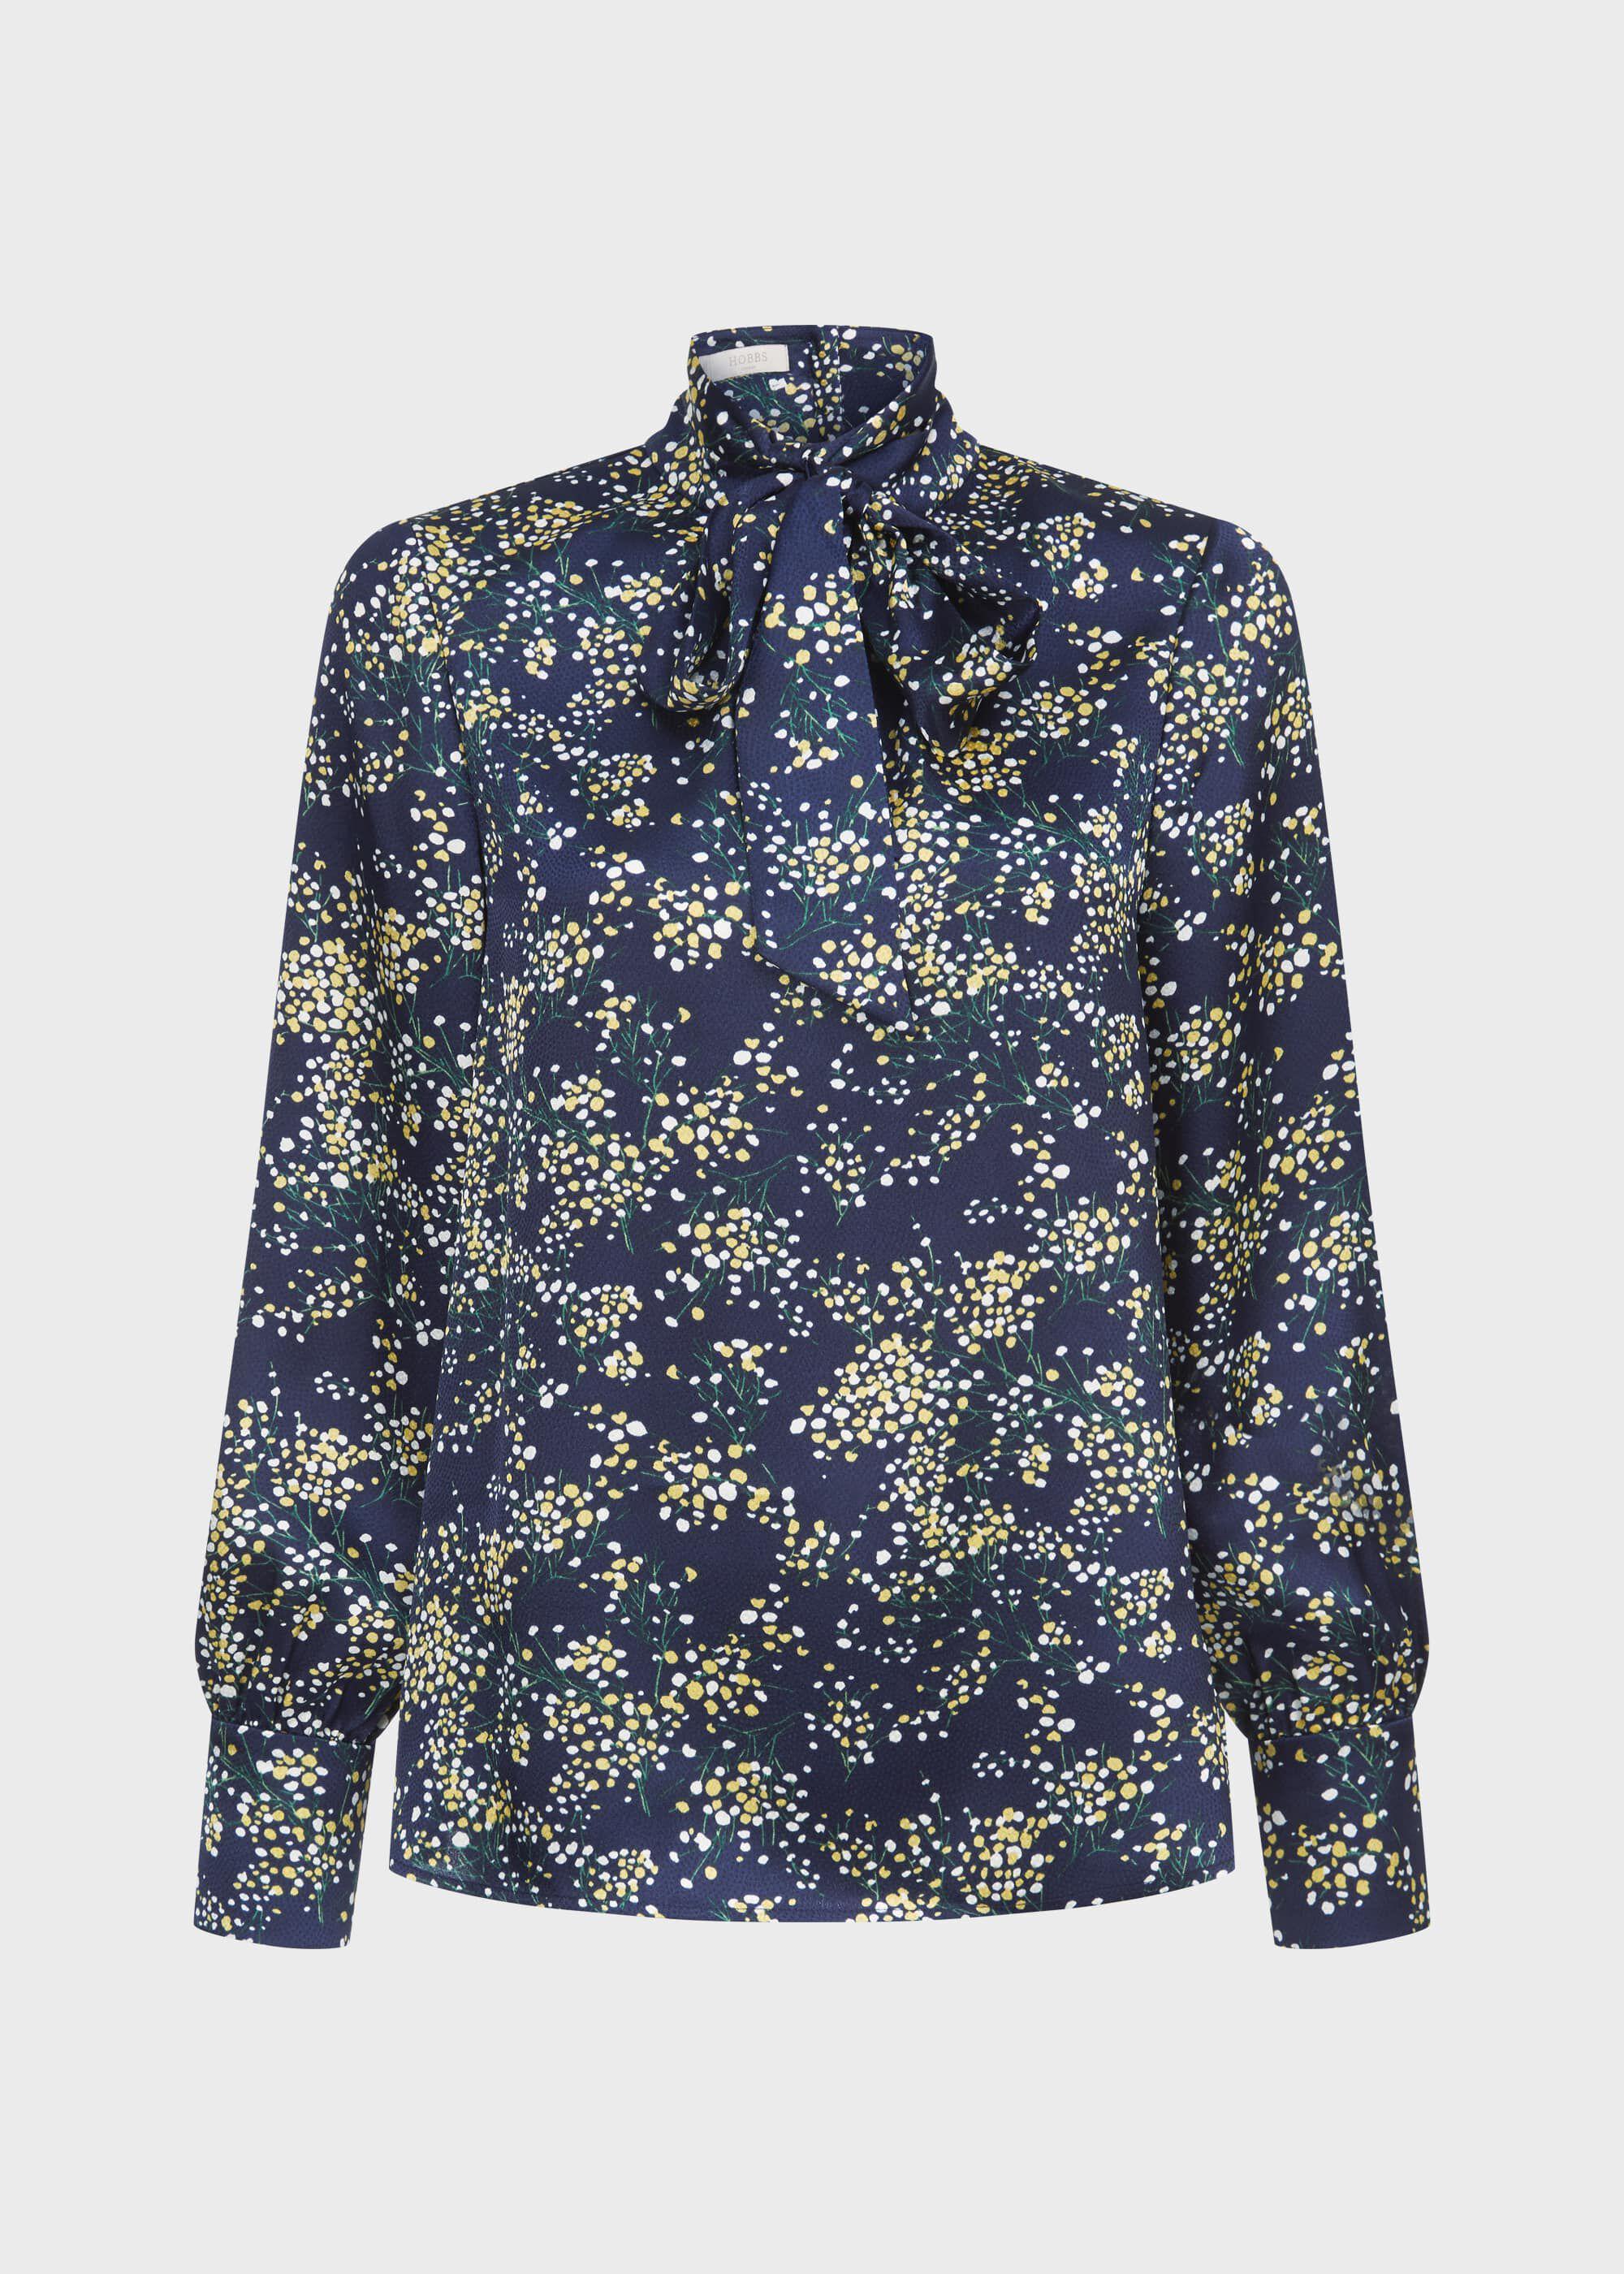 New season £89 Hobbs London Flora Floral Blouse Multi sz 10